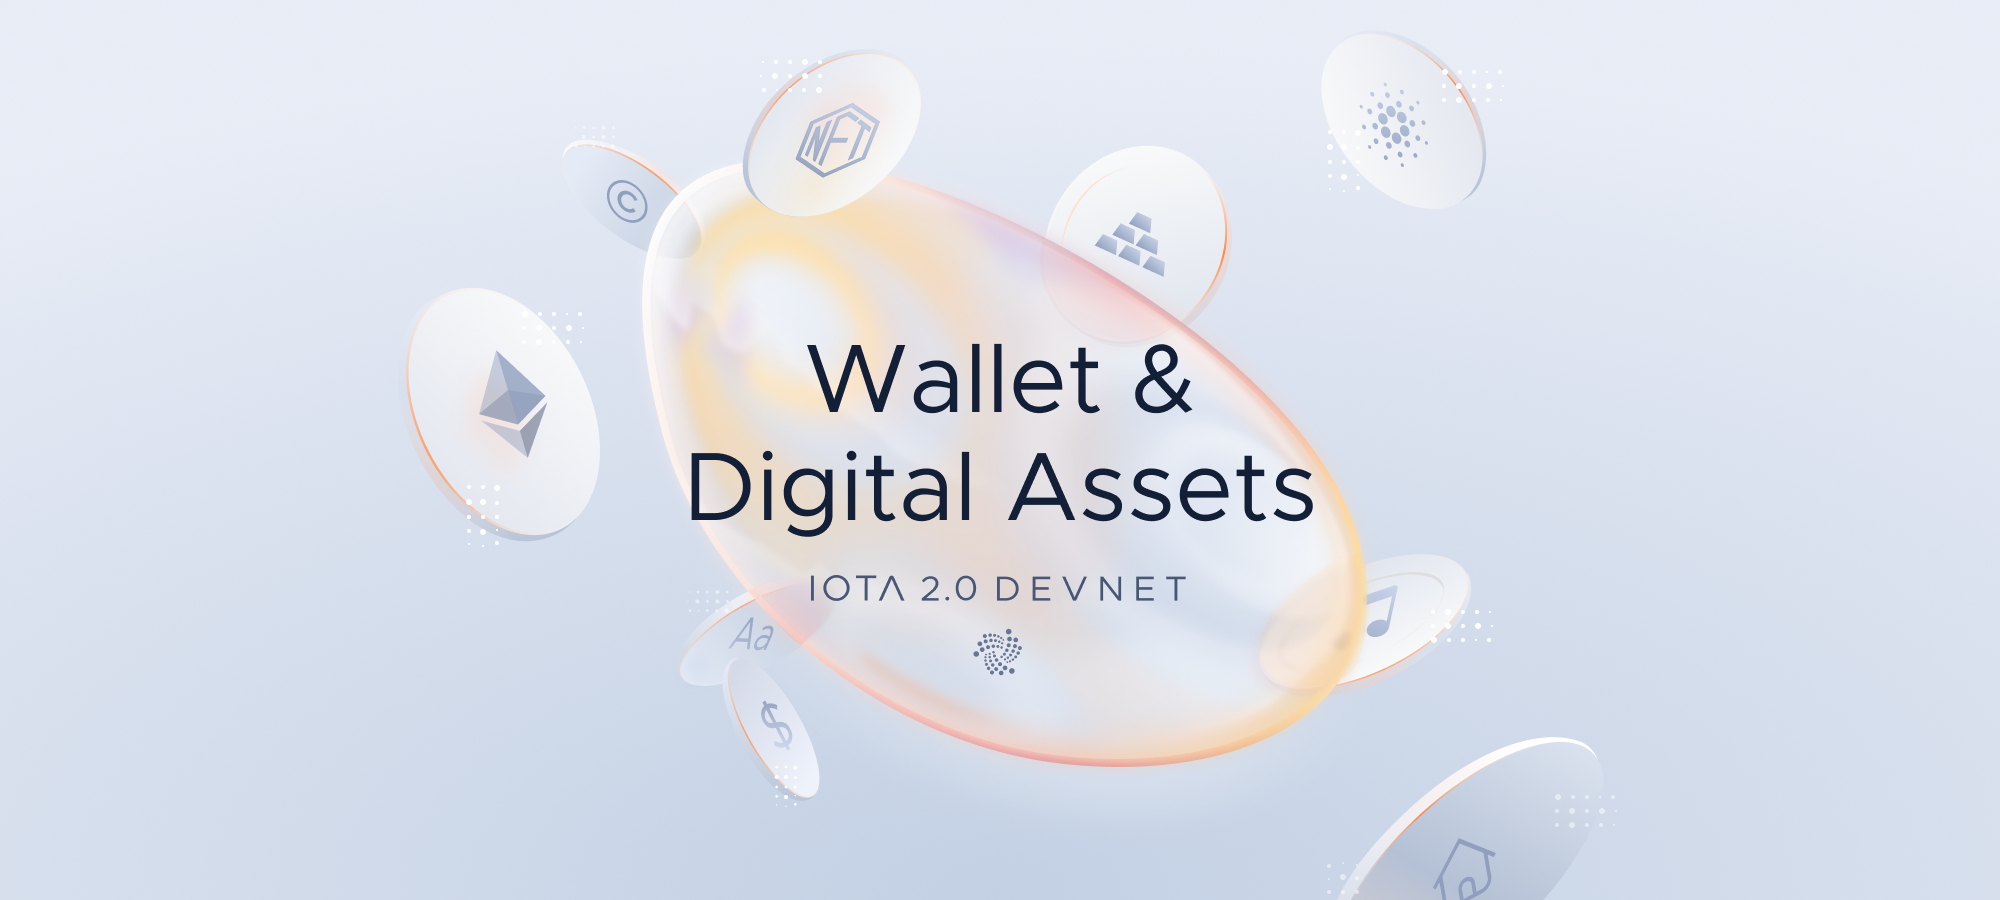 IOTA Native Digital Assets - DevNet Version